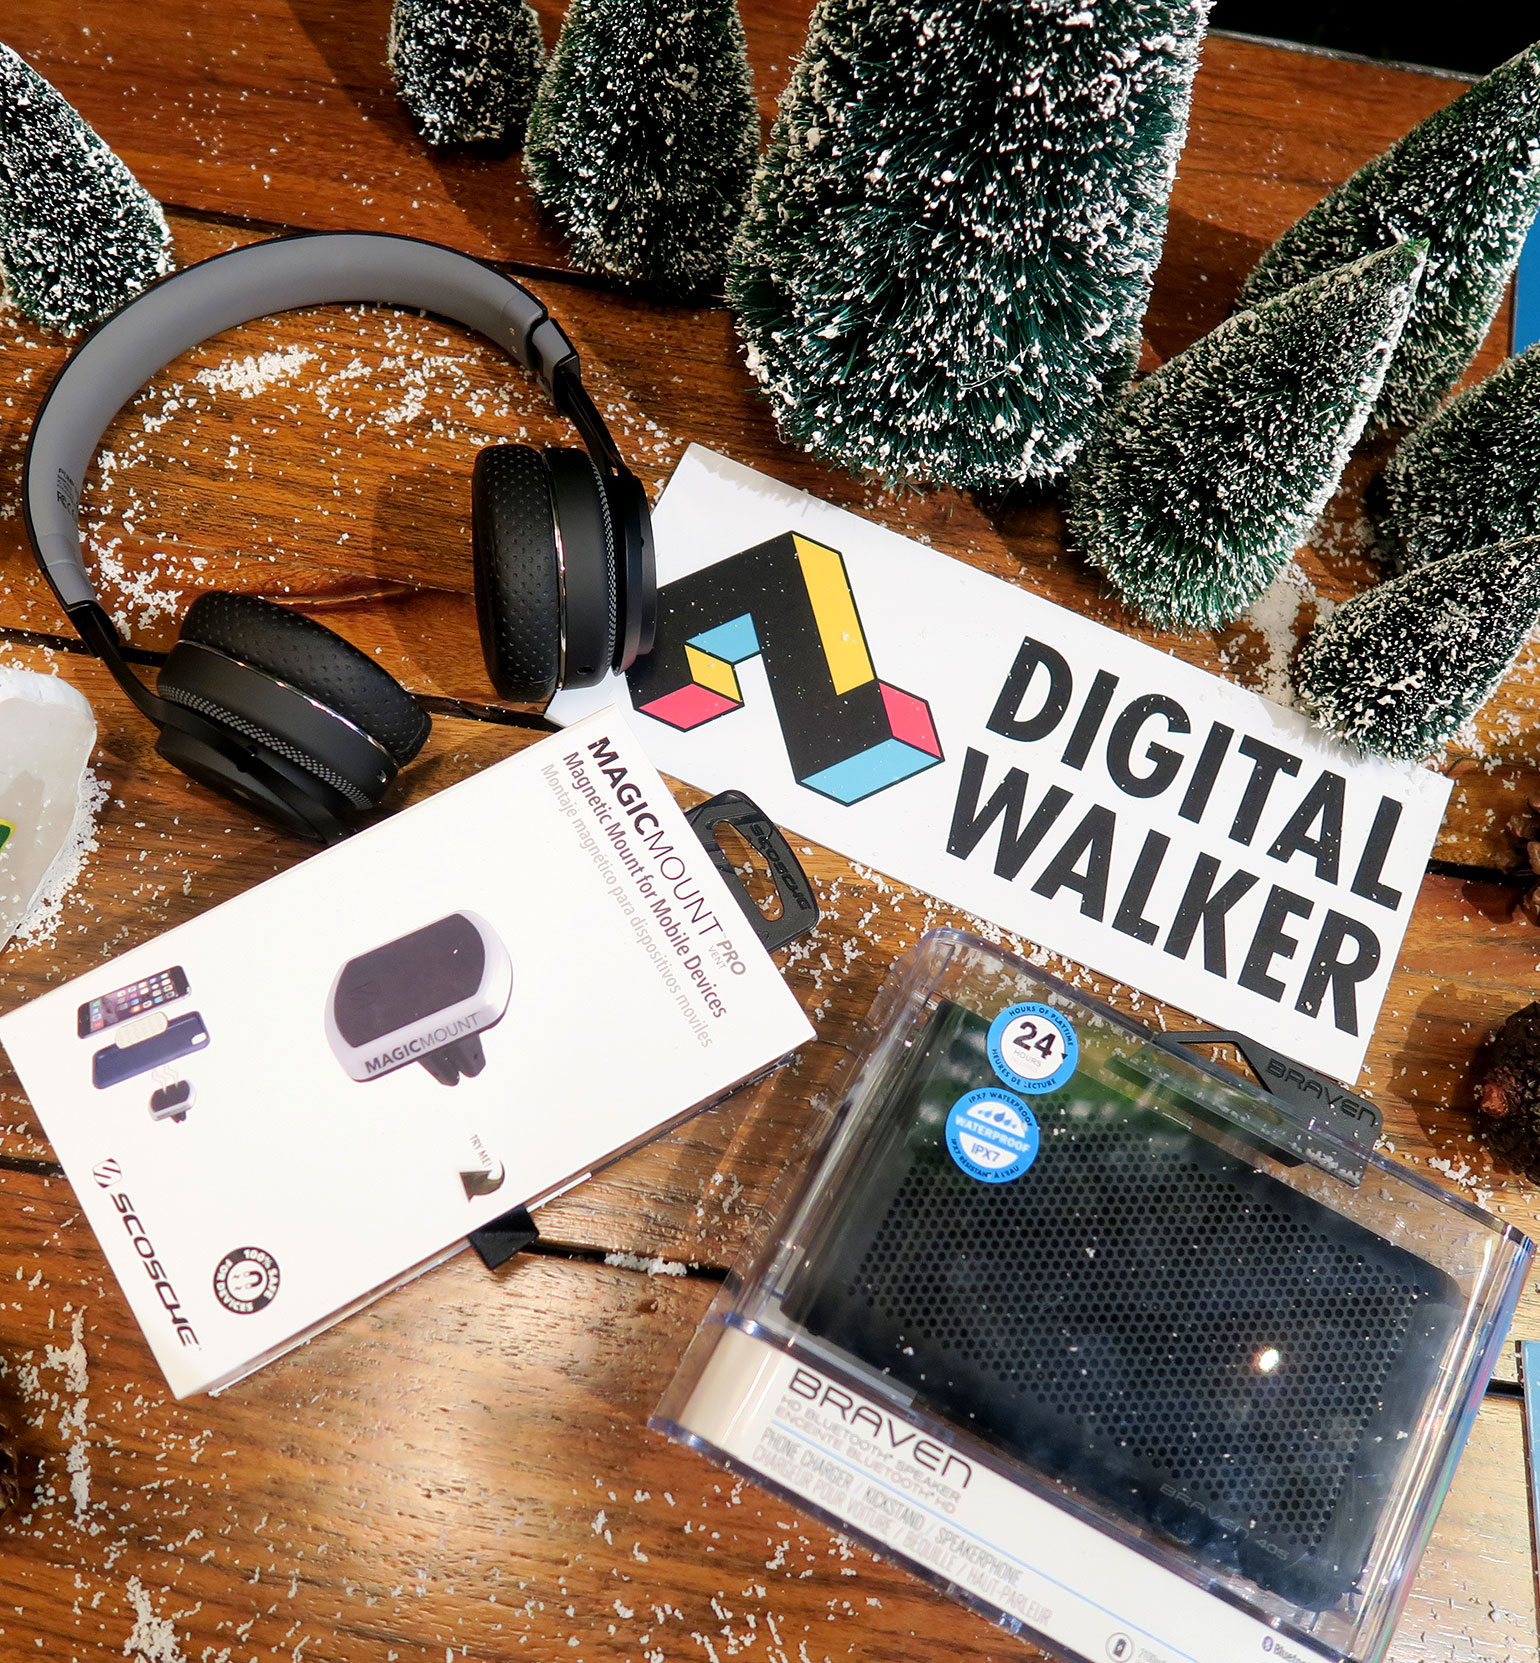 1.1 Digital Walker Products Review - Gen-zel.com (c)